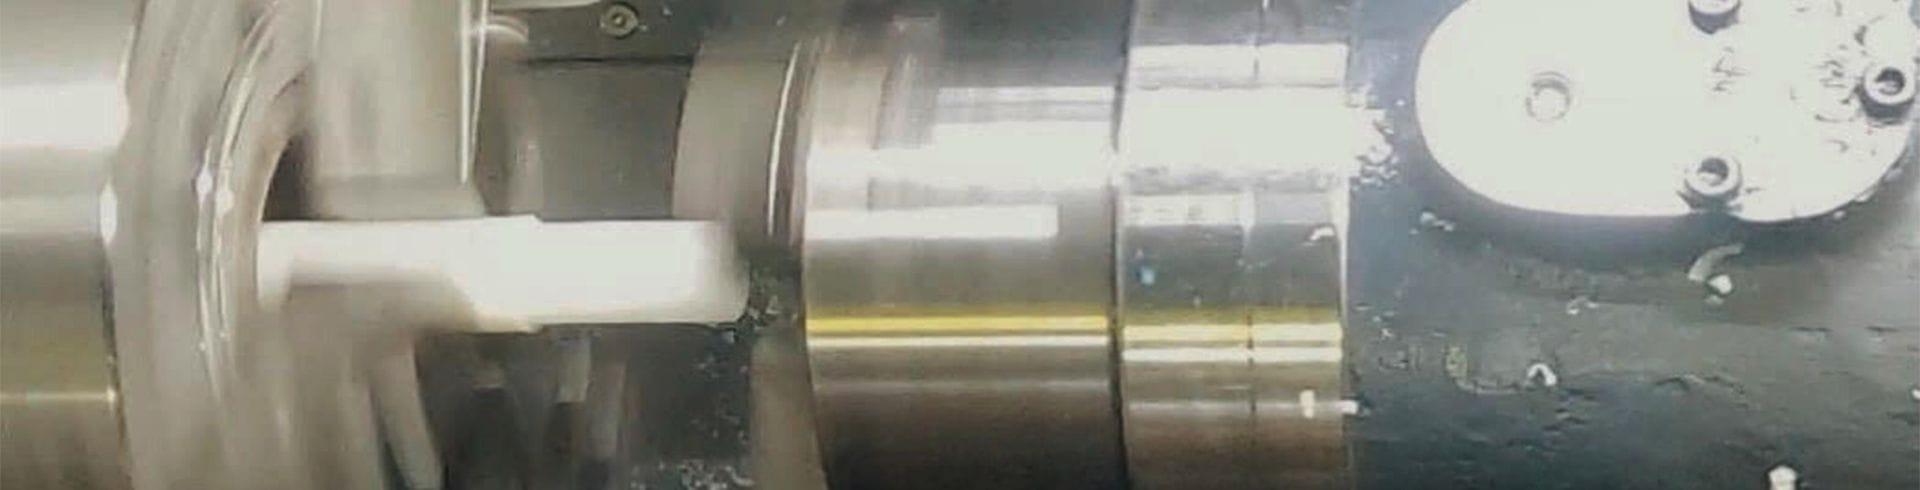 Doosan Lynx 2100 LSY | NC Precision Engineering